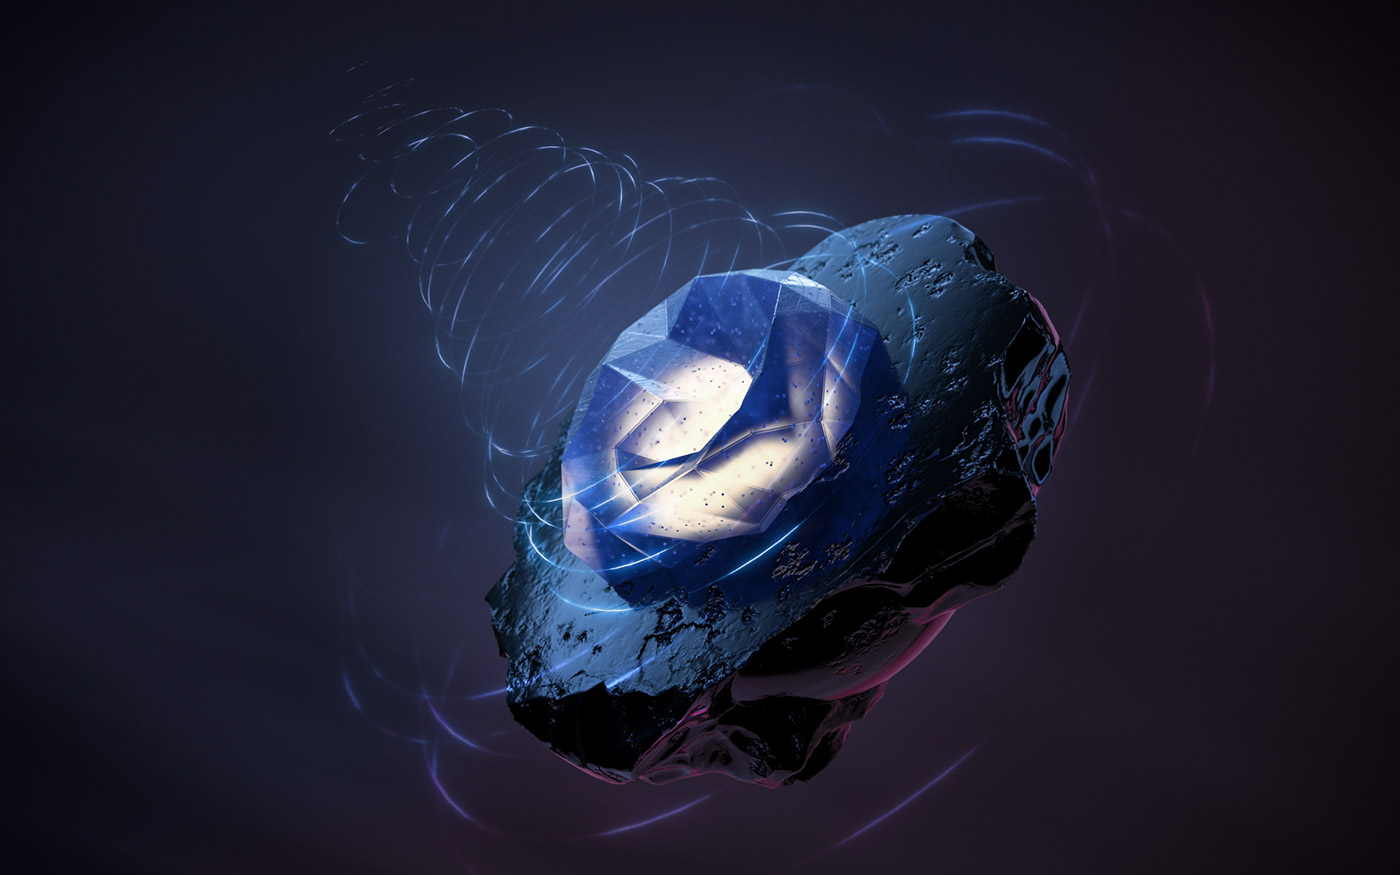 crystal transparent volcanic stone energy concept float Render 3D